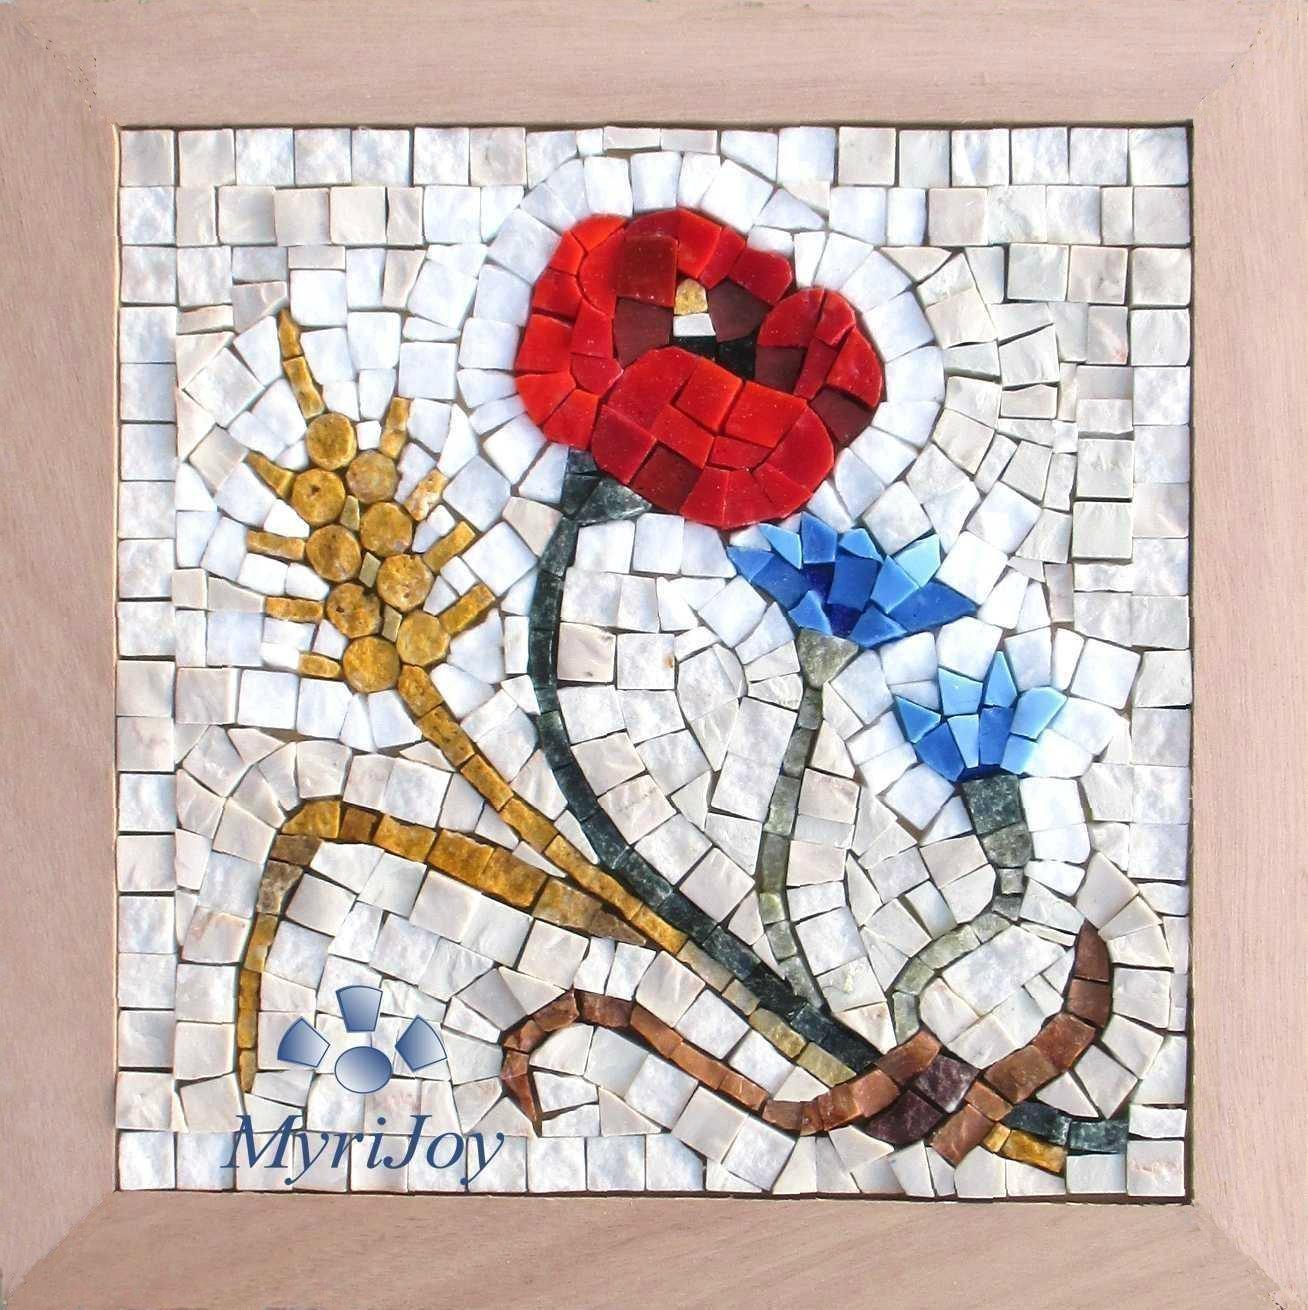 Amazoncom Diy Mosaic Craft Kit For Adults Four Seasons Summer 9